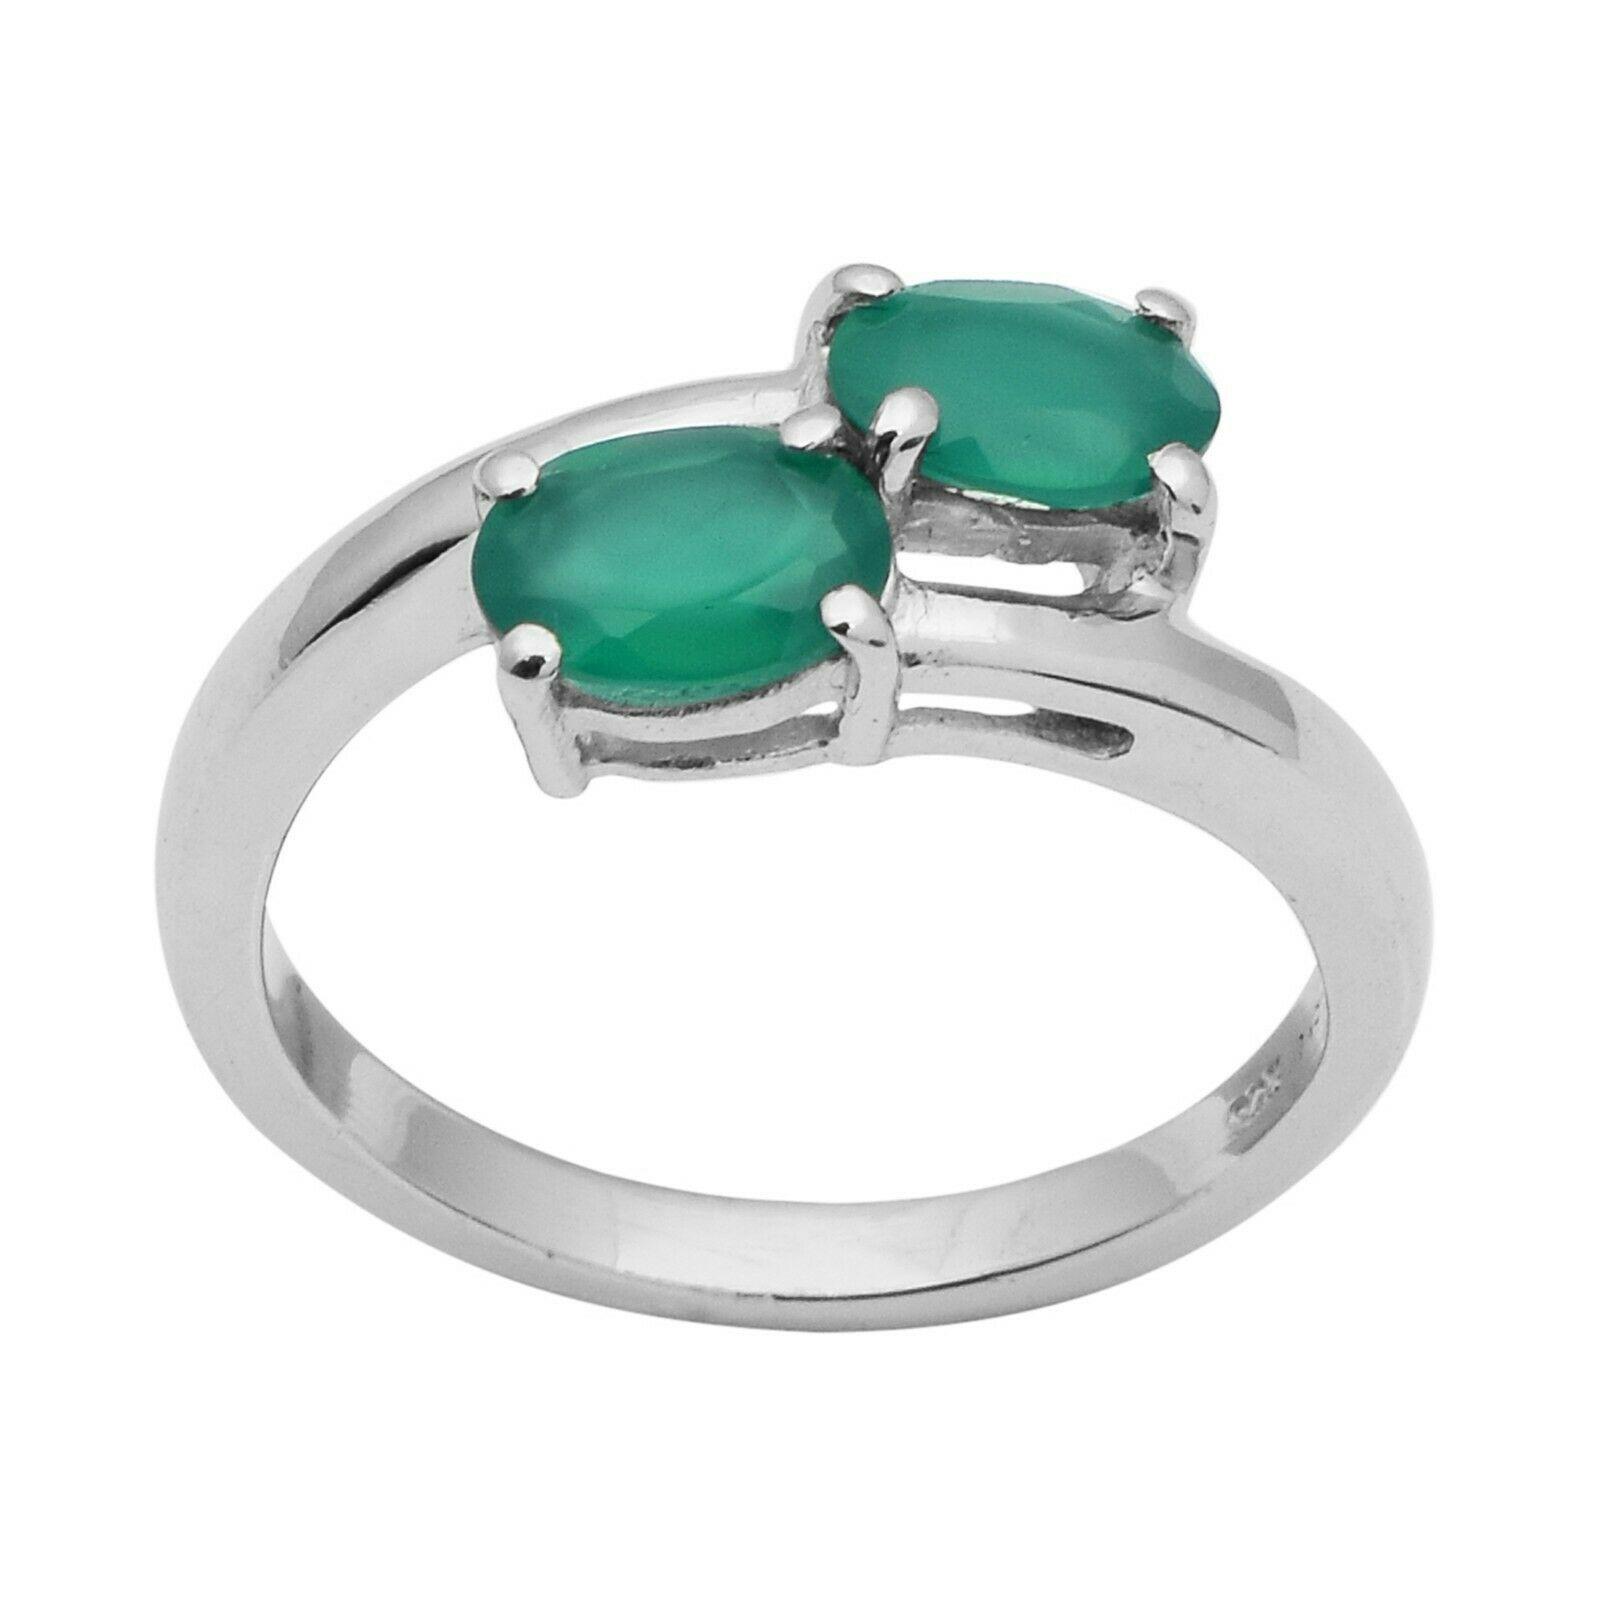 925 Sterling Silver Green Onyx Oval Cut By Pass Split Shank Women Stackable Ring